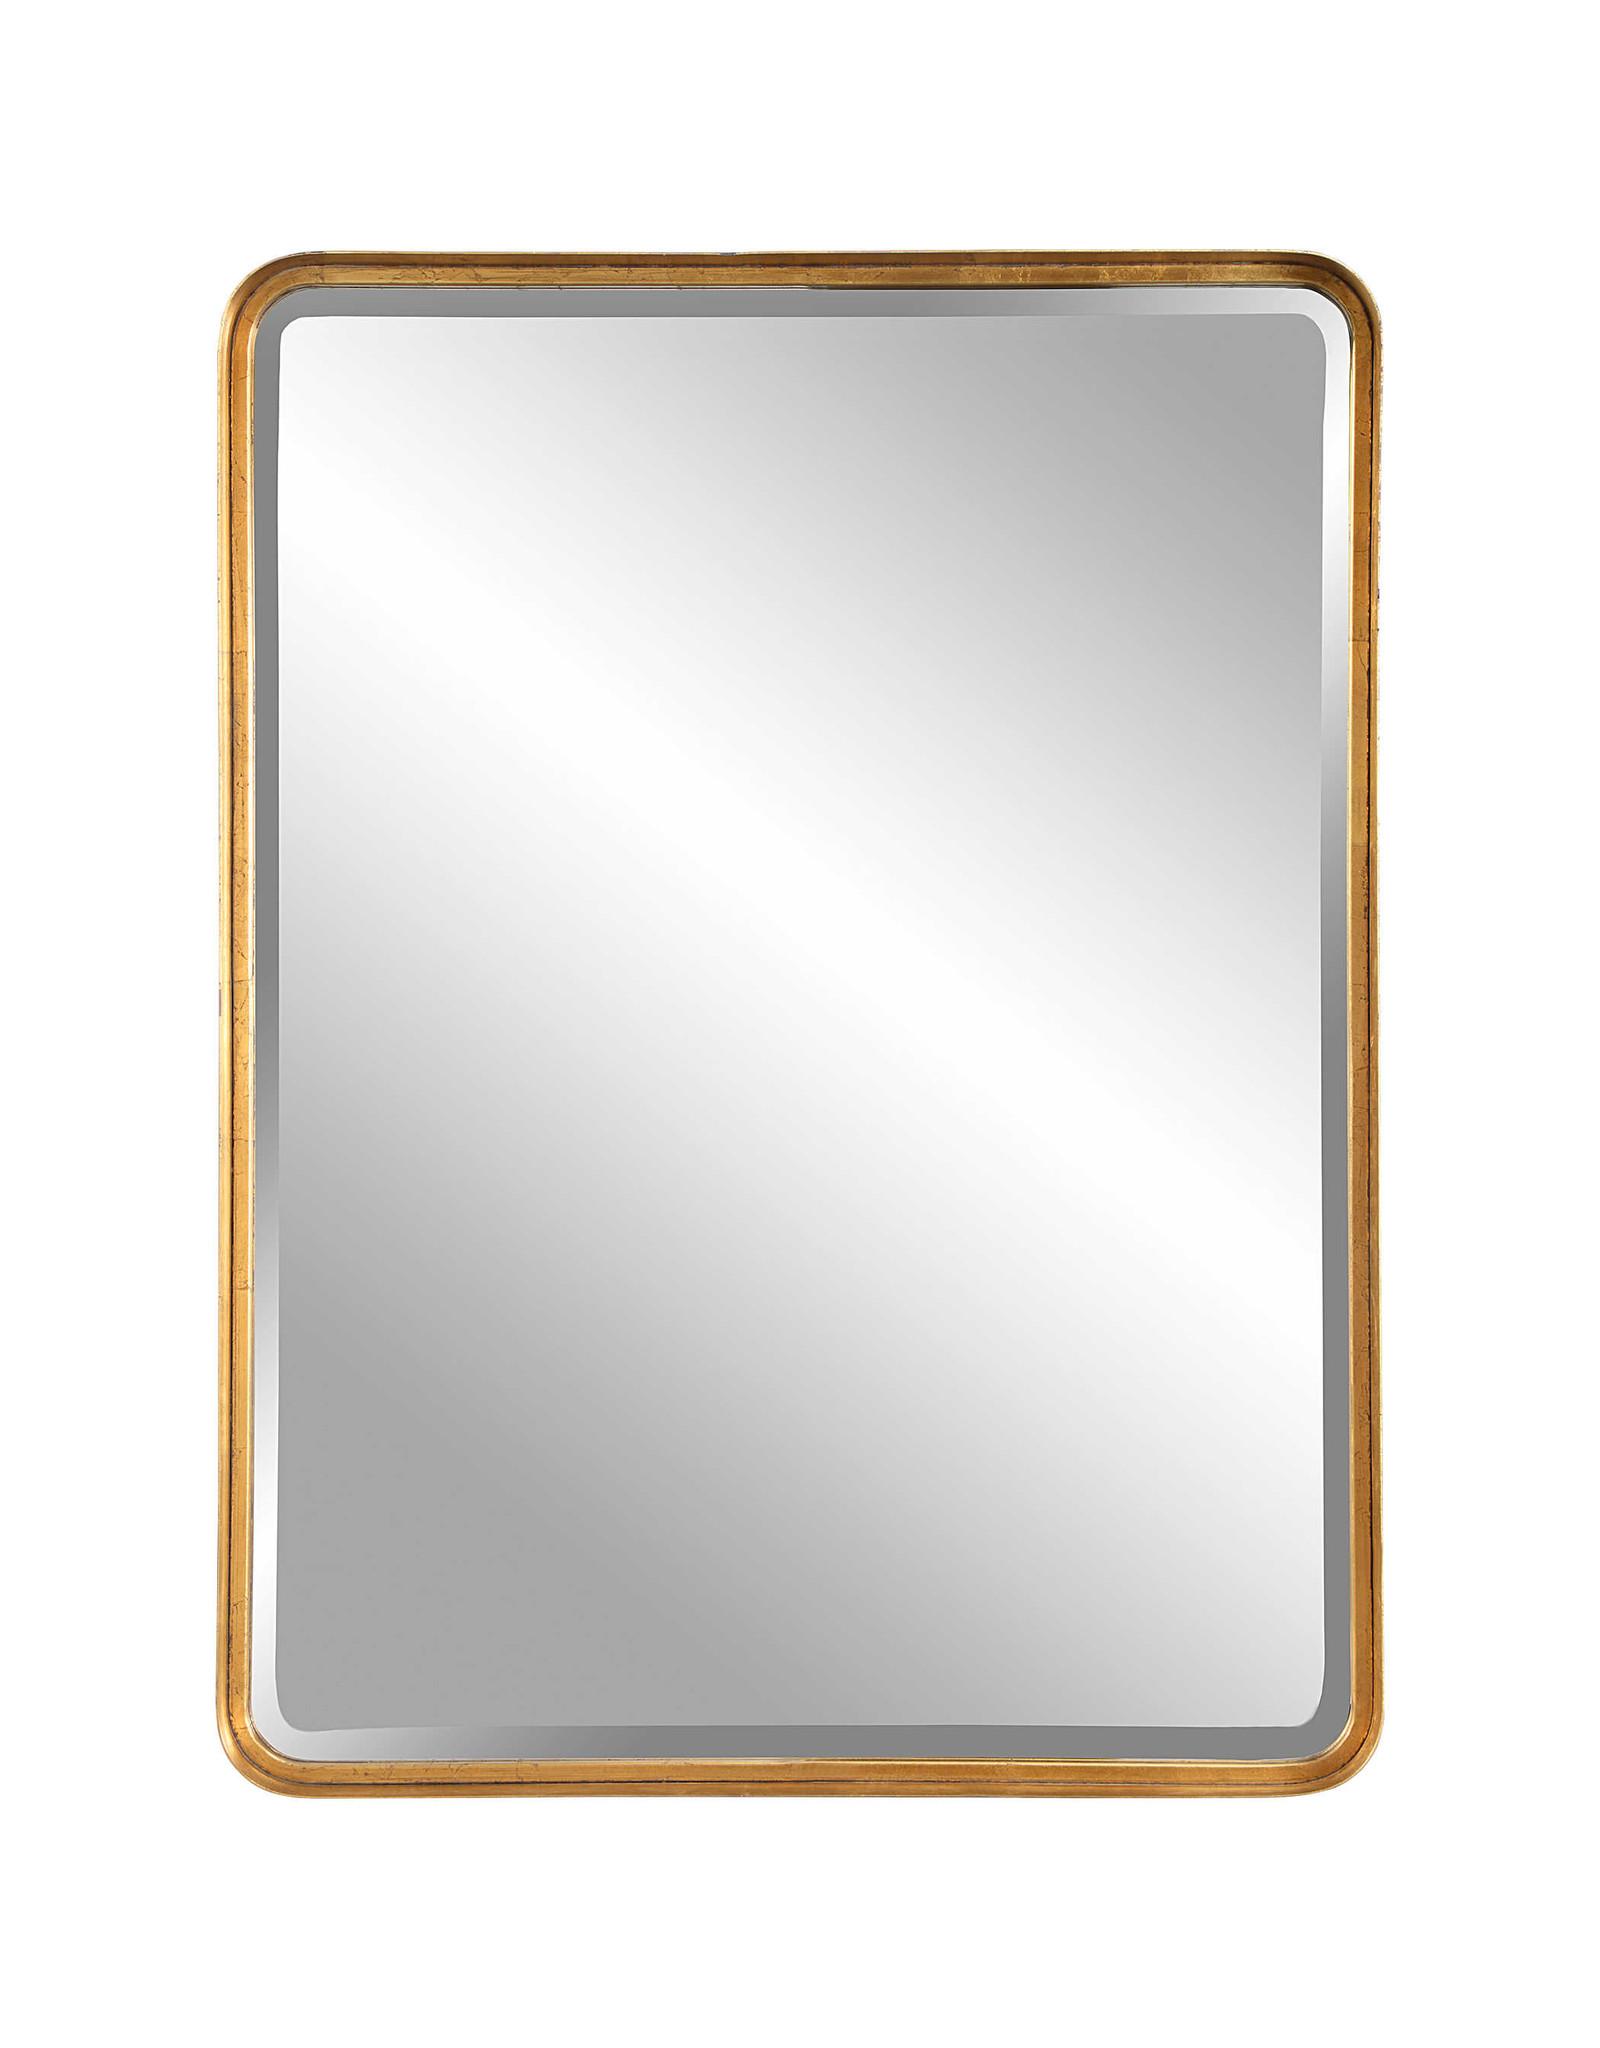 Uttermost *Crofton Gold Large Mirror